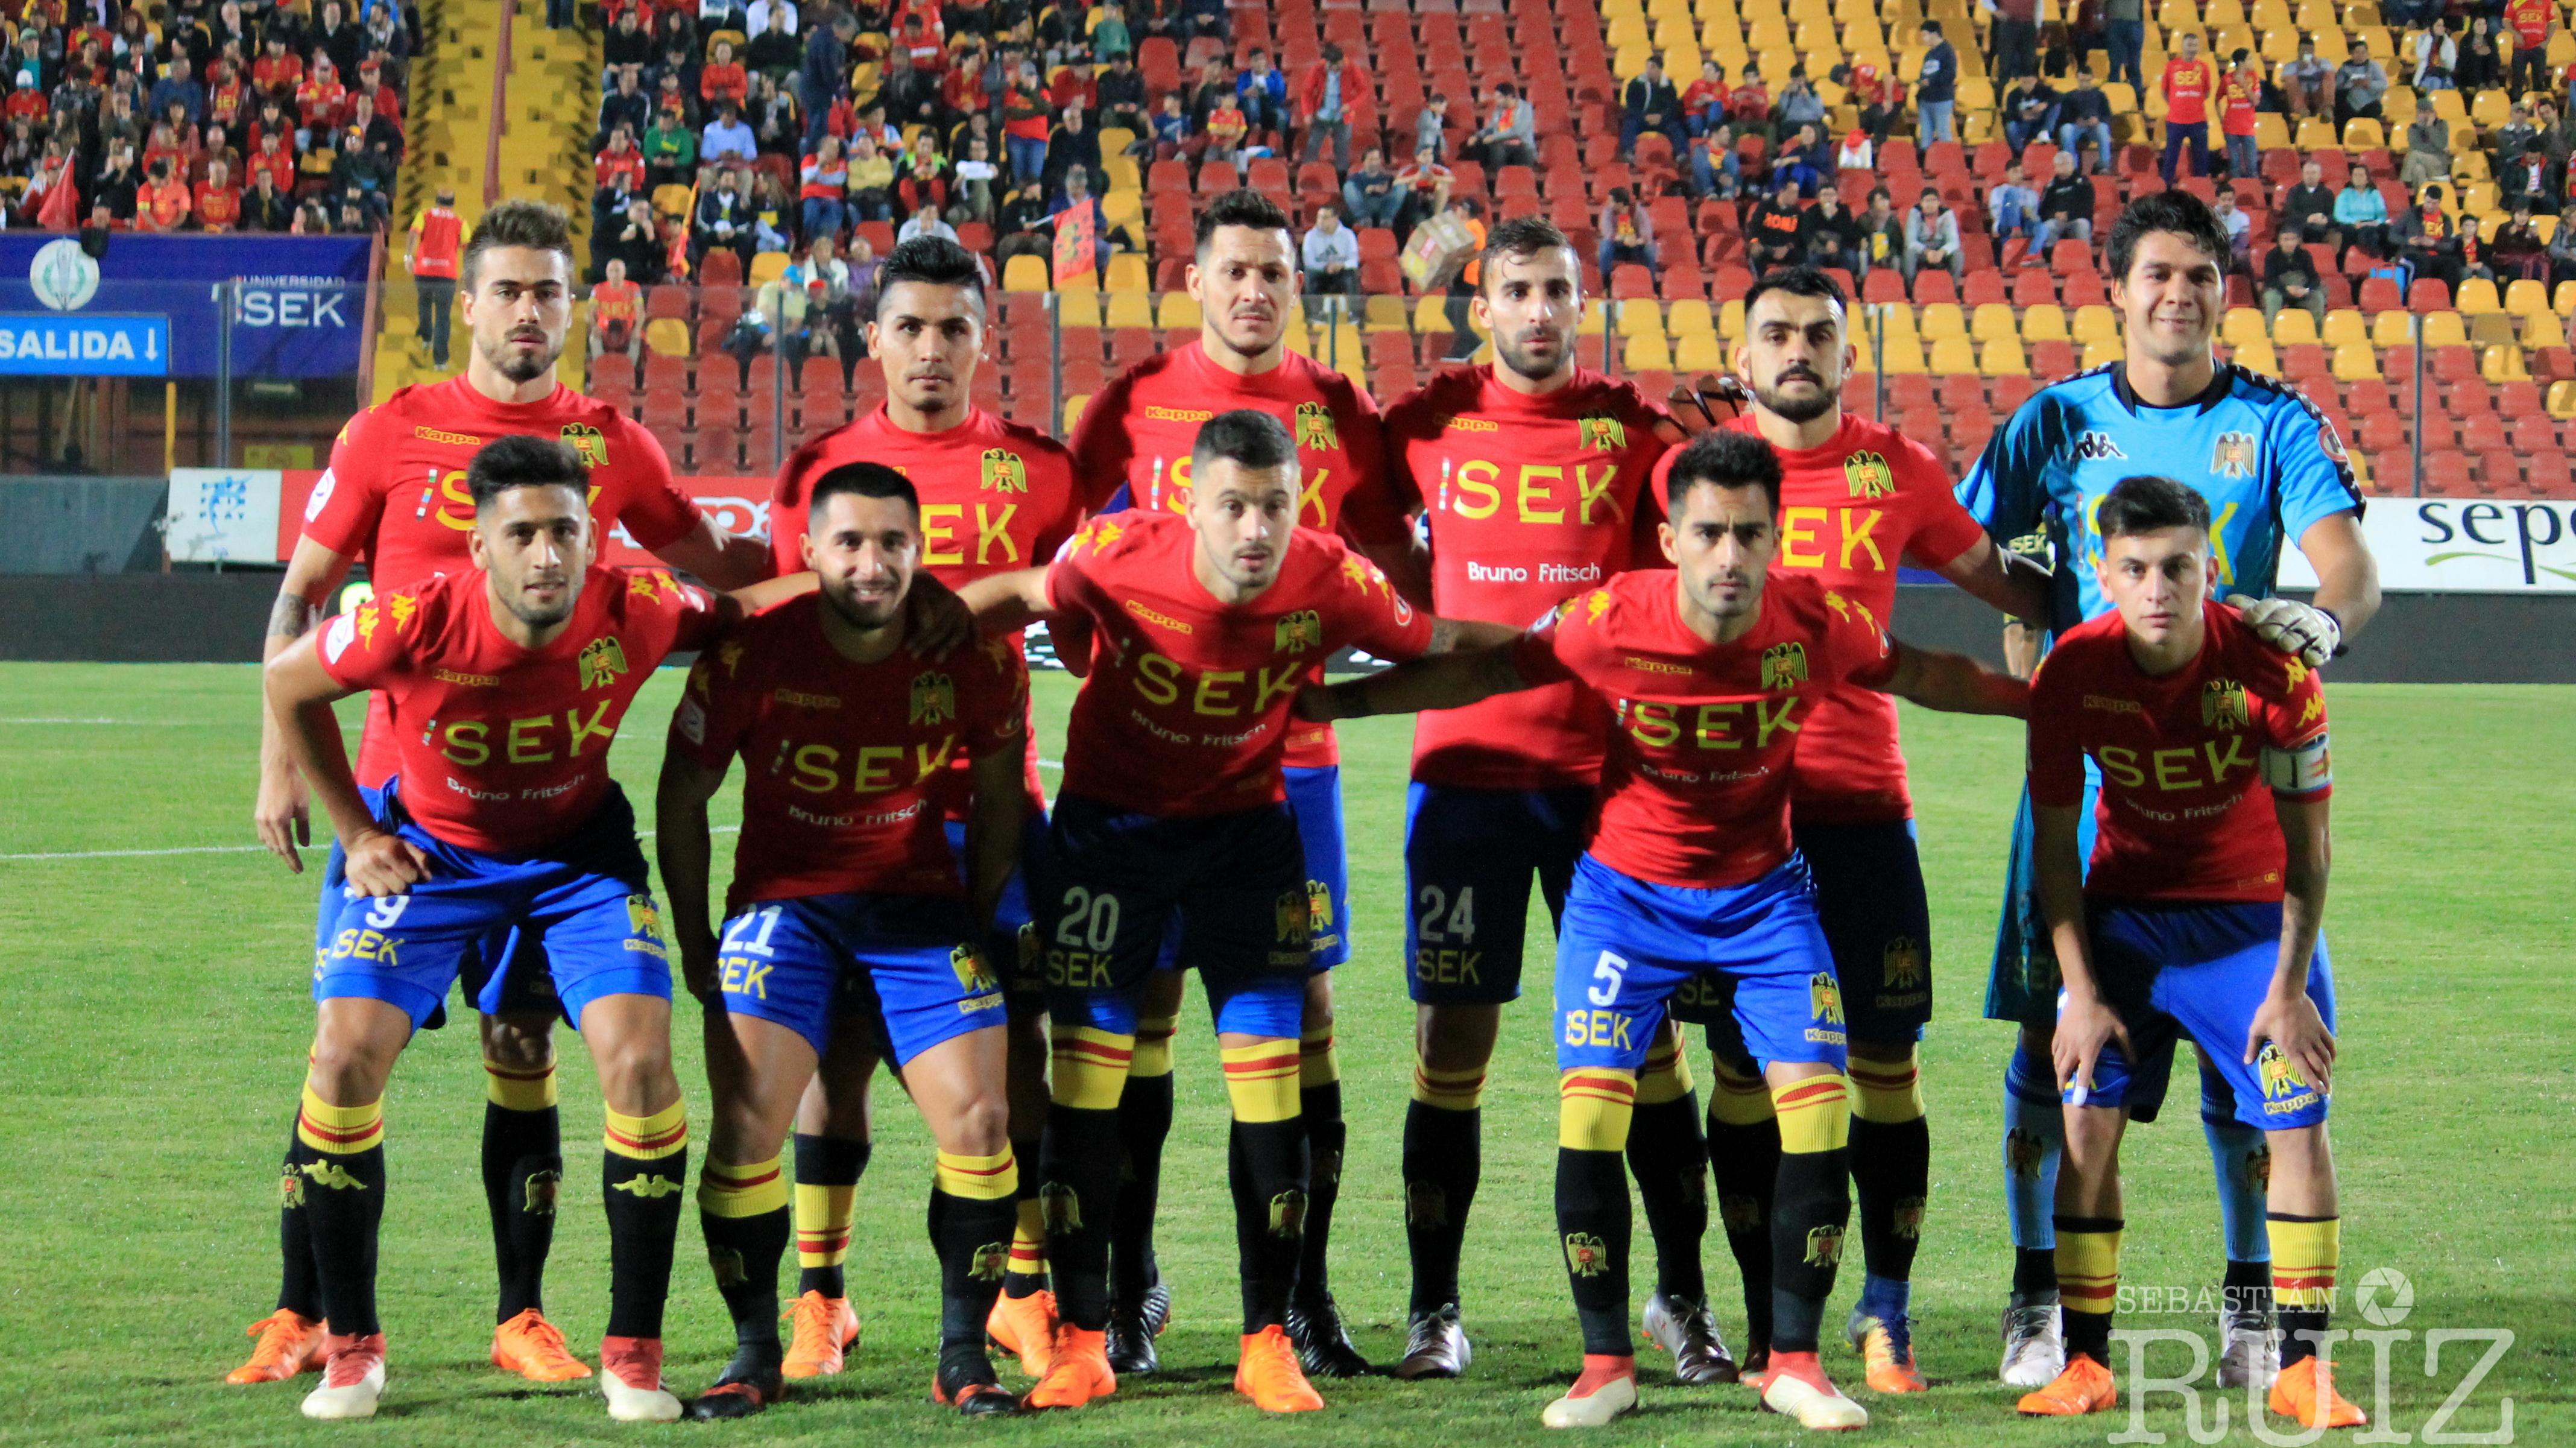 Unión Española 4 - San Luis 0